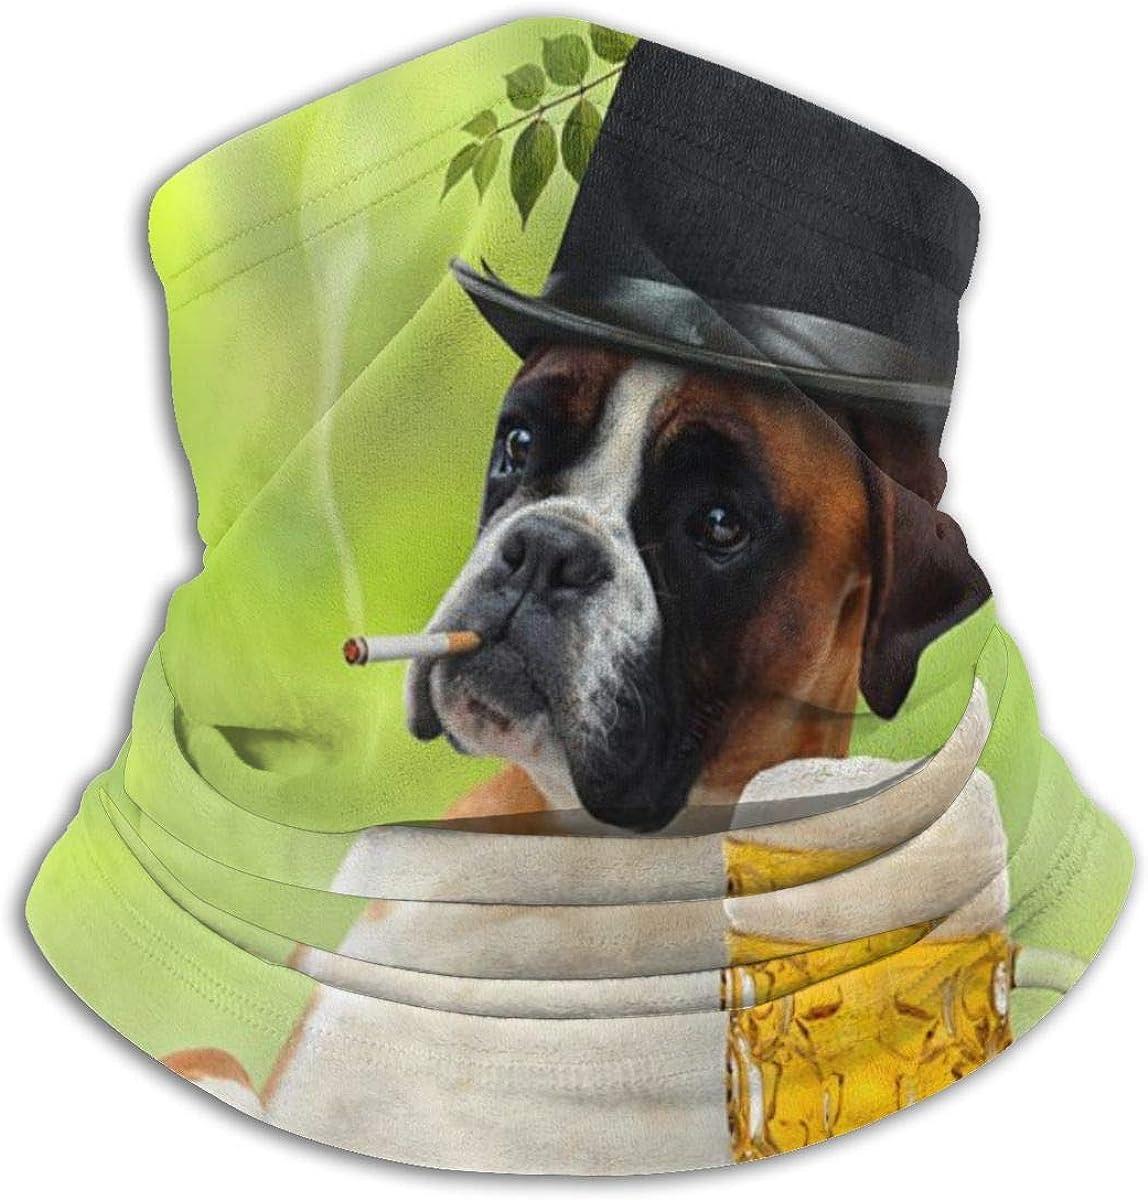 CLERO& Scarf Fleece Neck Warmer Smoking Dog Drink Beer Green Windproof Winter Neck Gaiter Cold Weather Face Mask for Men Women